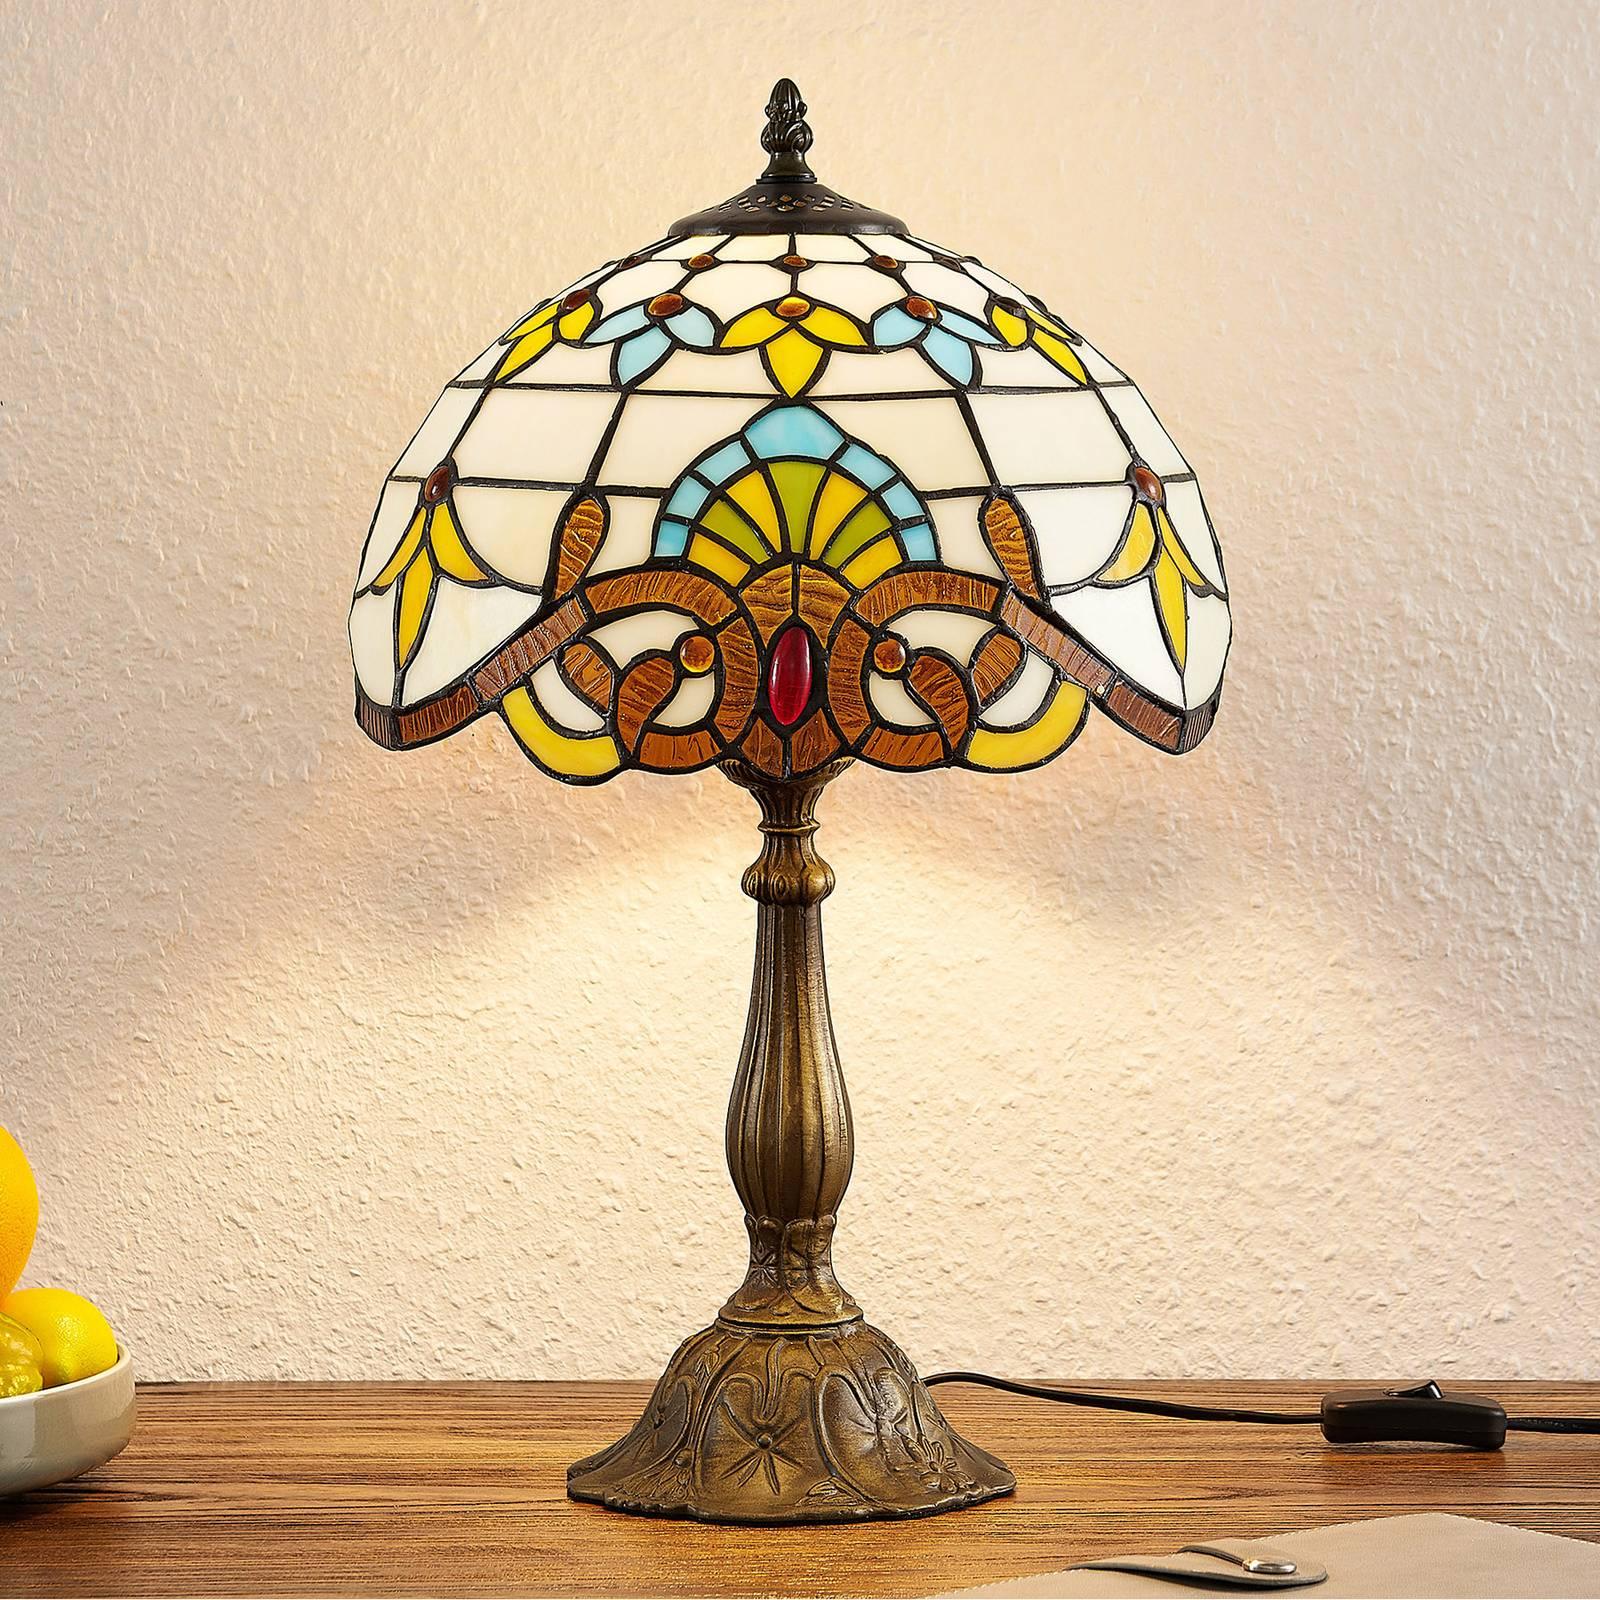 Lindby Audrey tafellamp in Tiffany-stijl